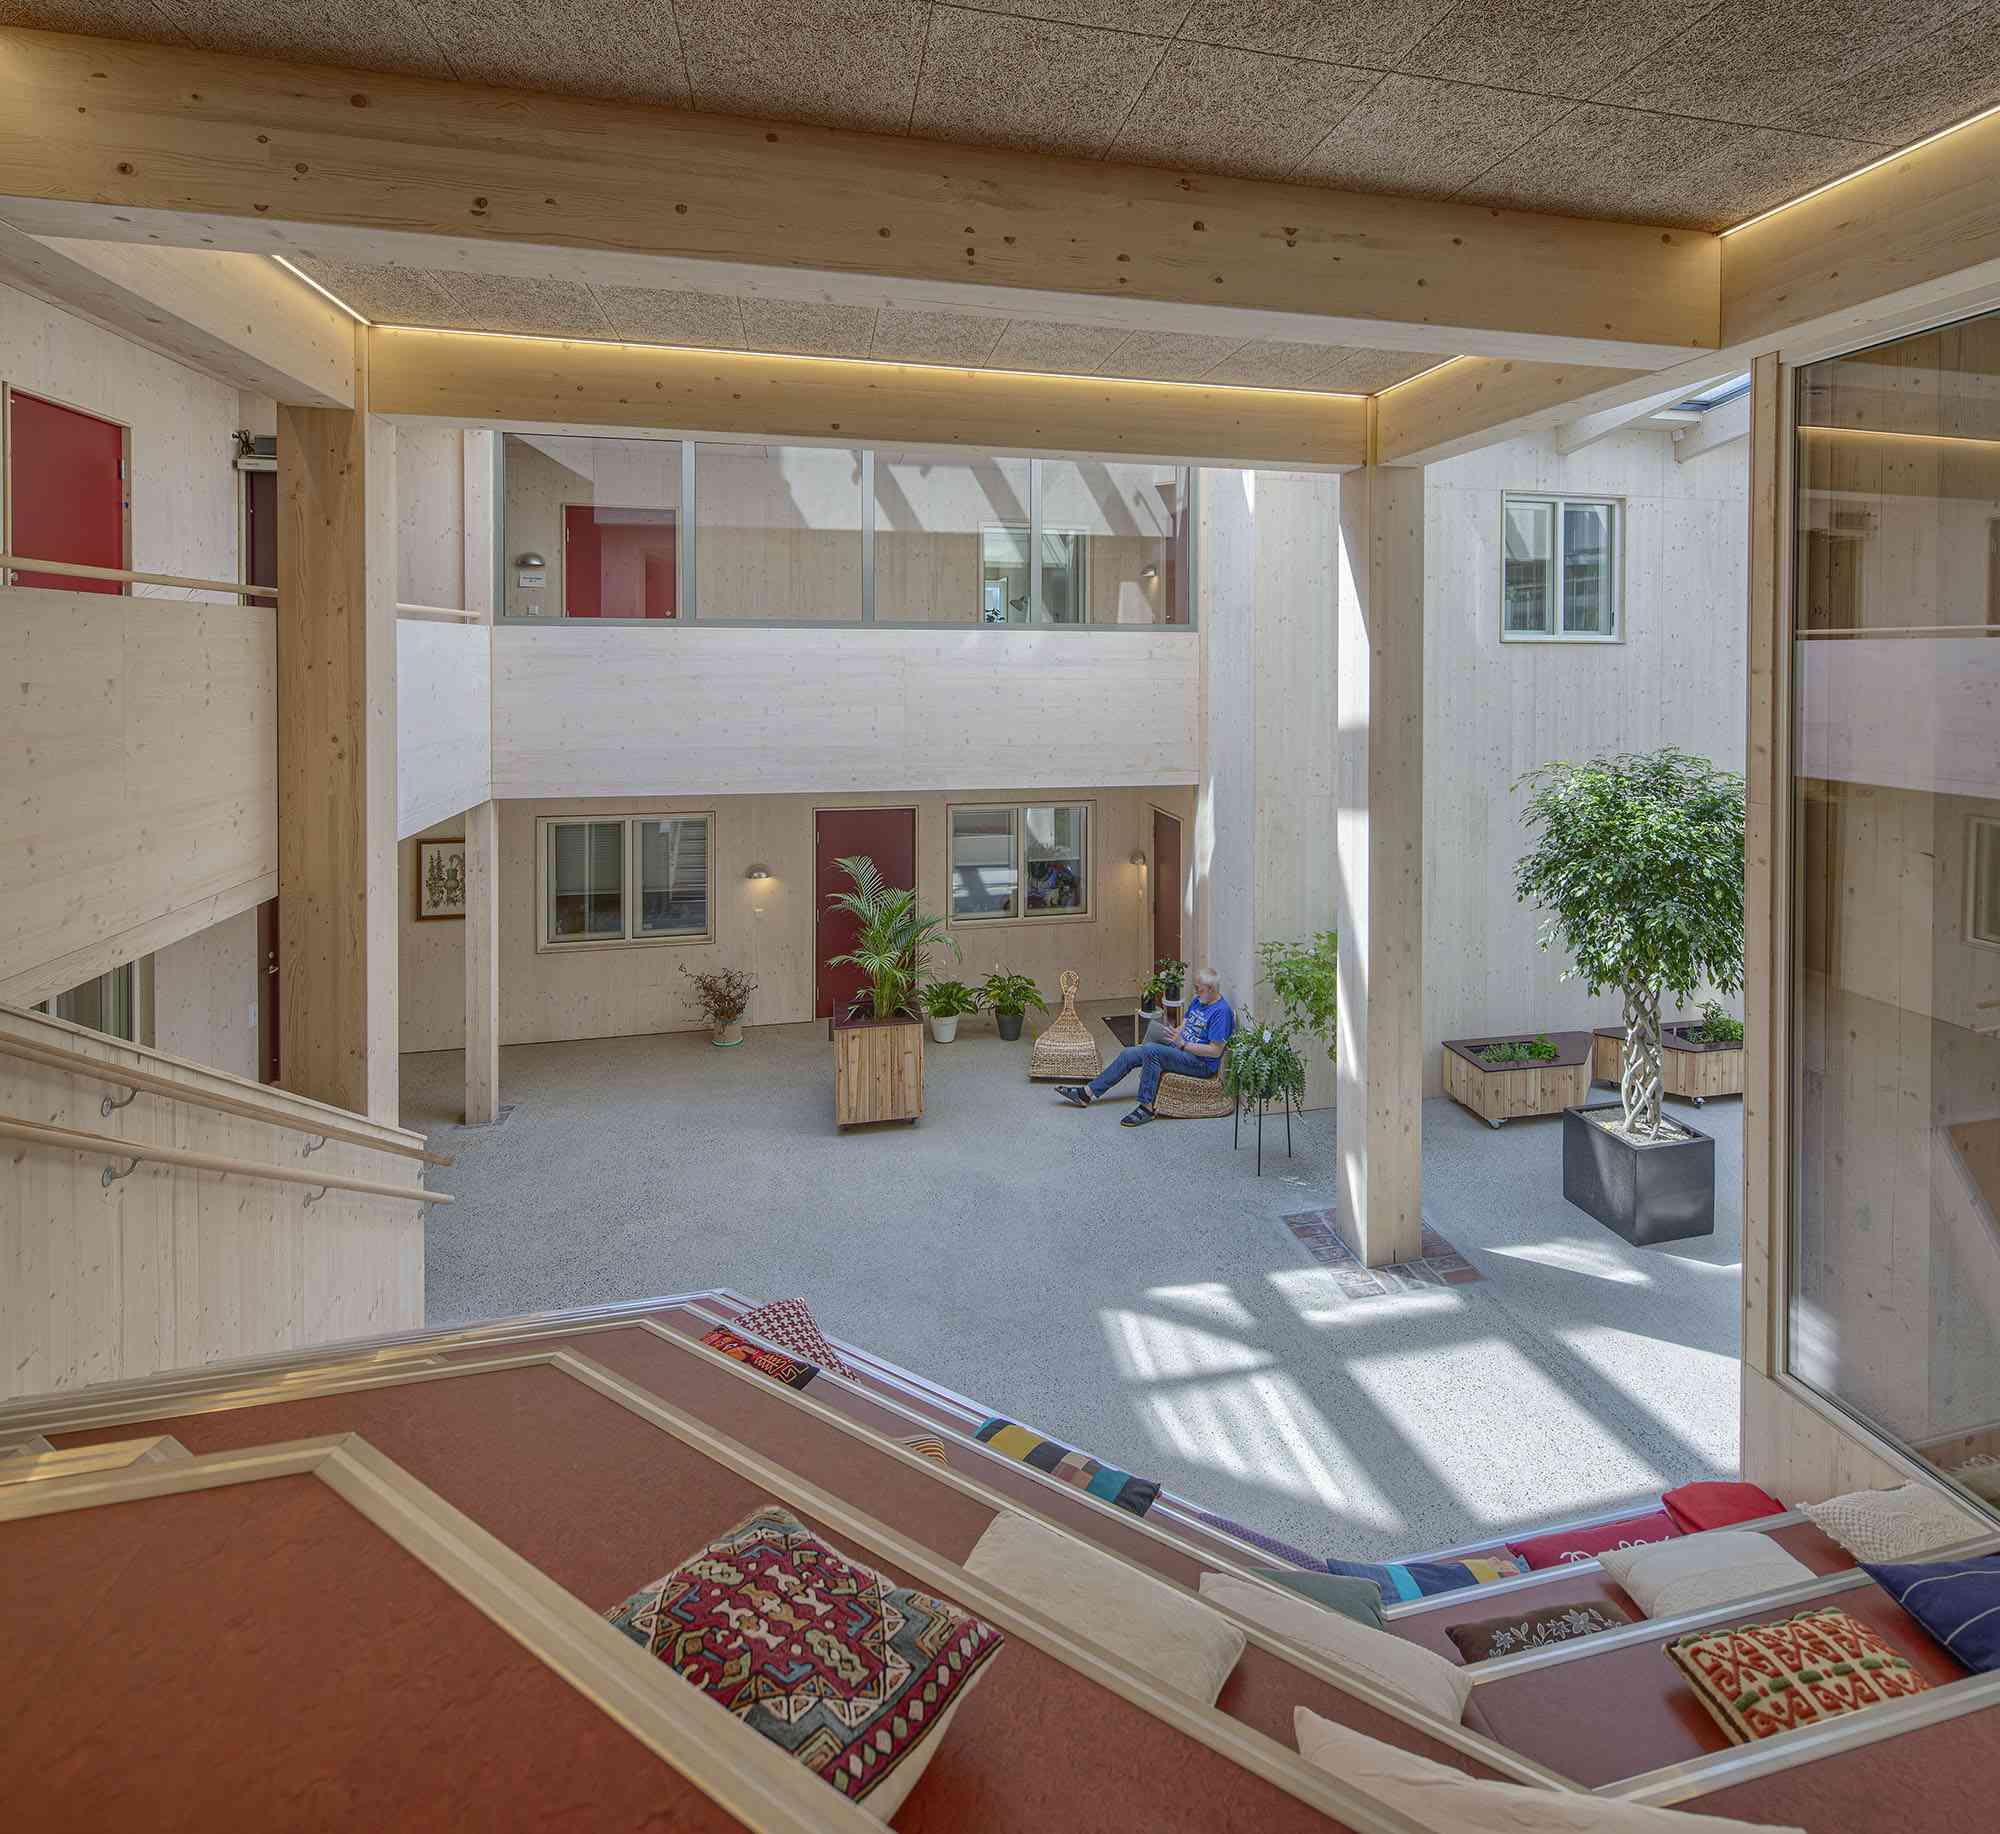 Vindmøllebakken Cohousing Project by Helen & Hard Architects courtyard entry interior